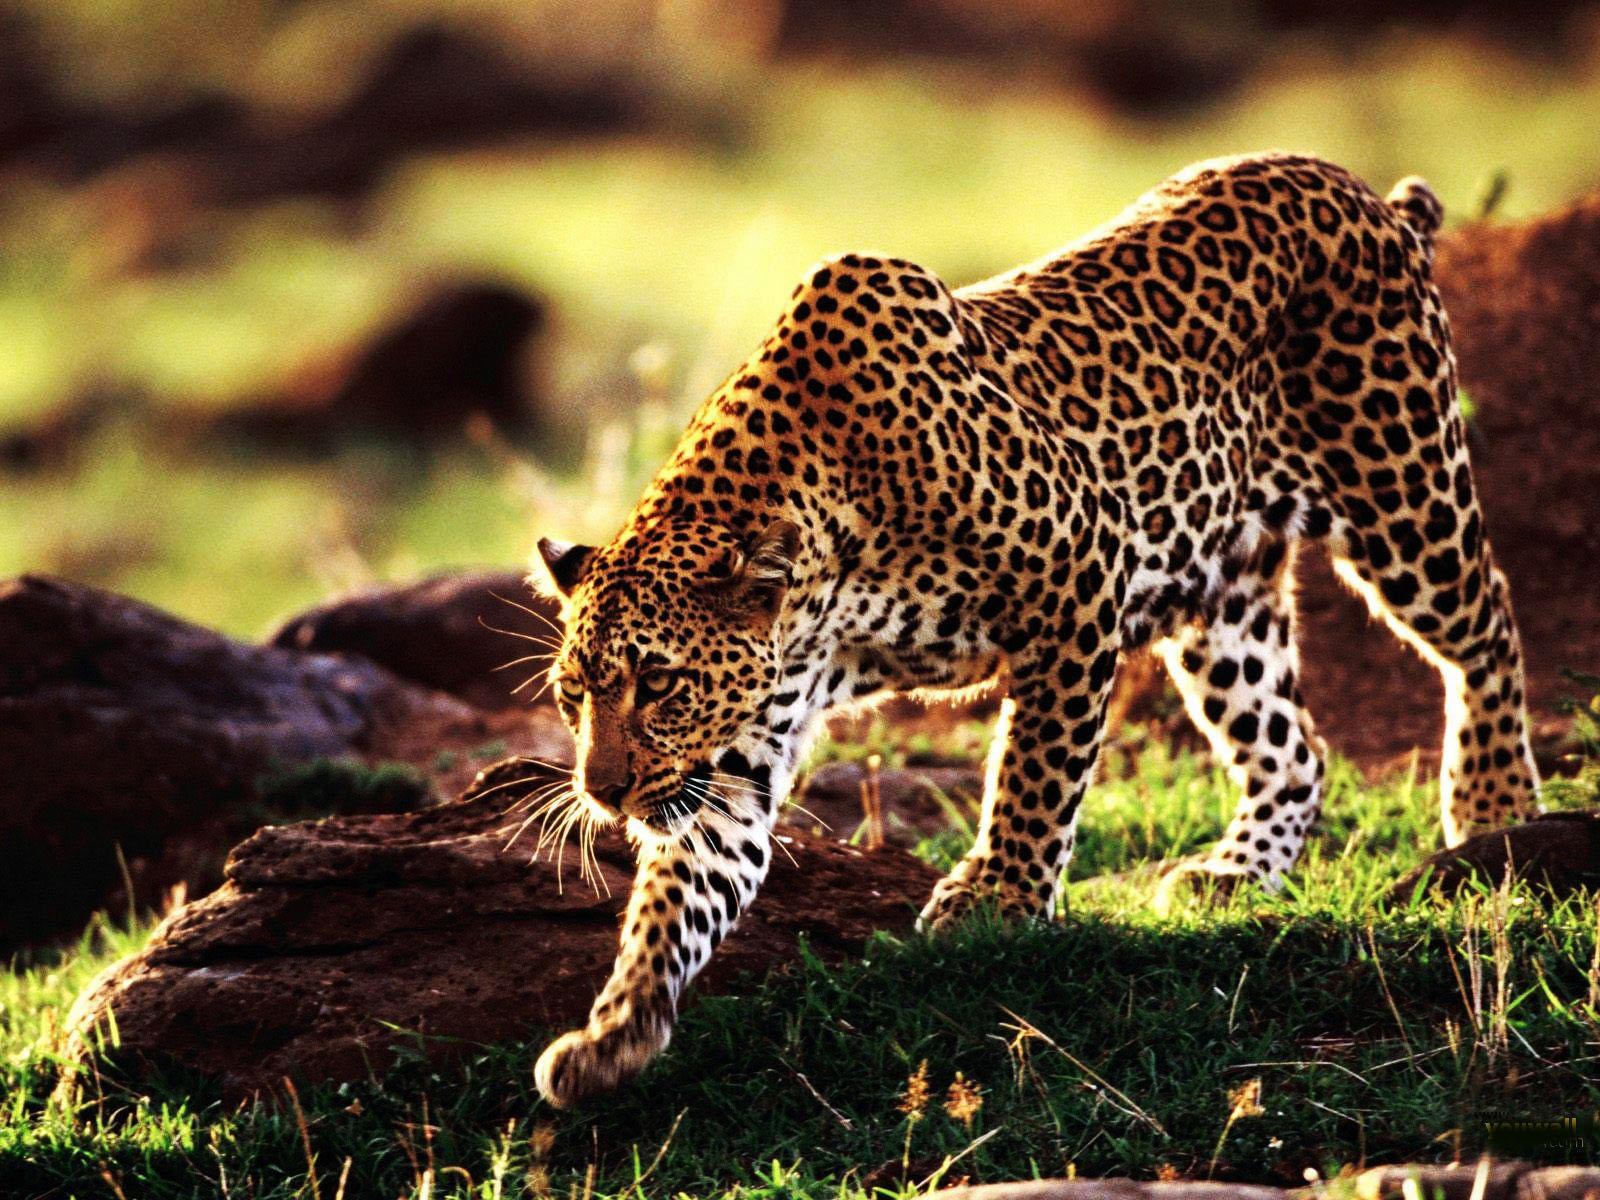 Hd Animals Wallpapers Free: Cheetah Dangerous Hd WallpapersPictures 2013